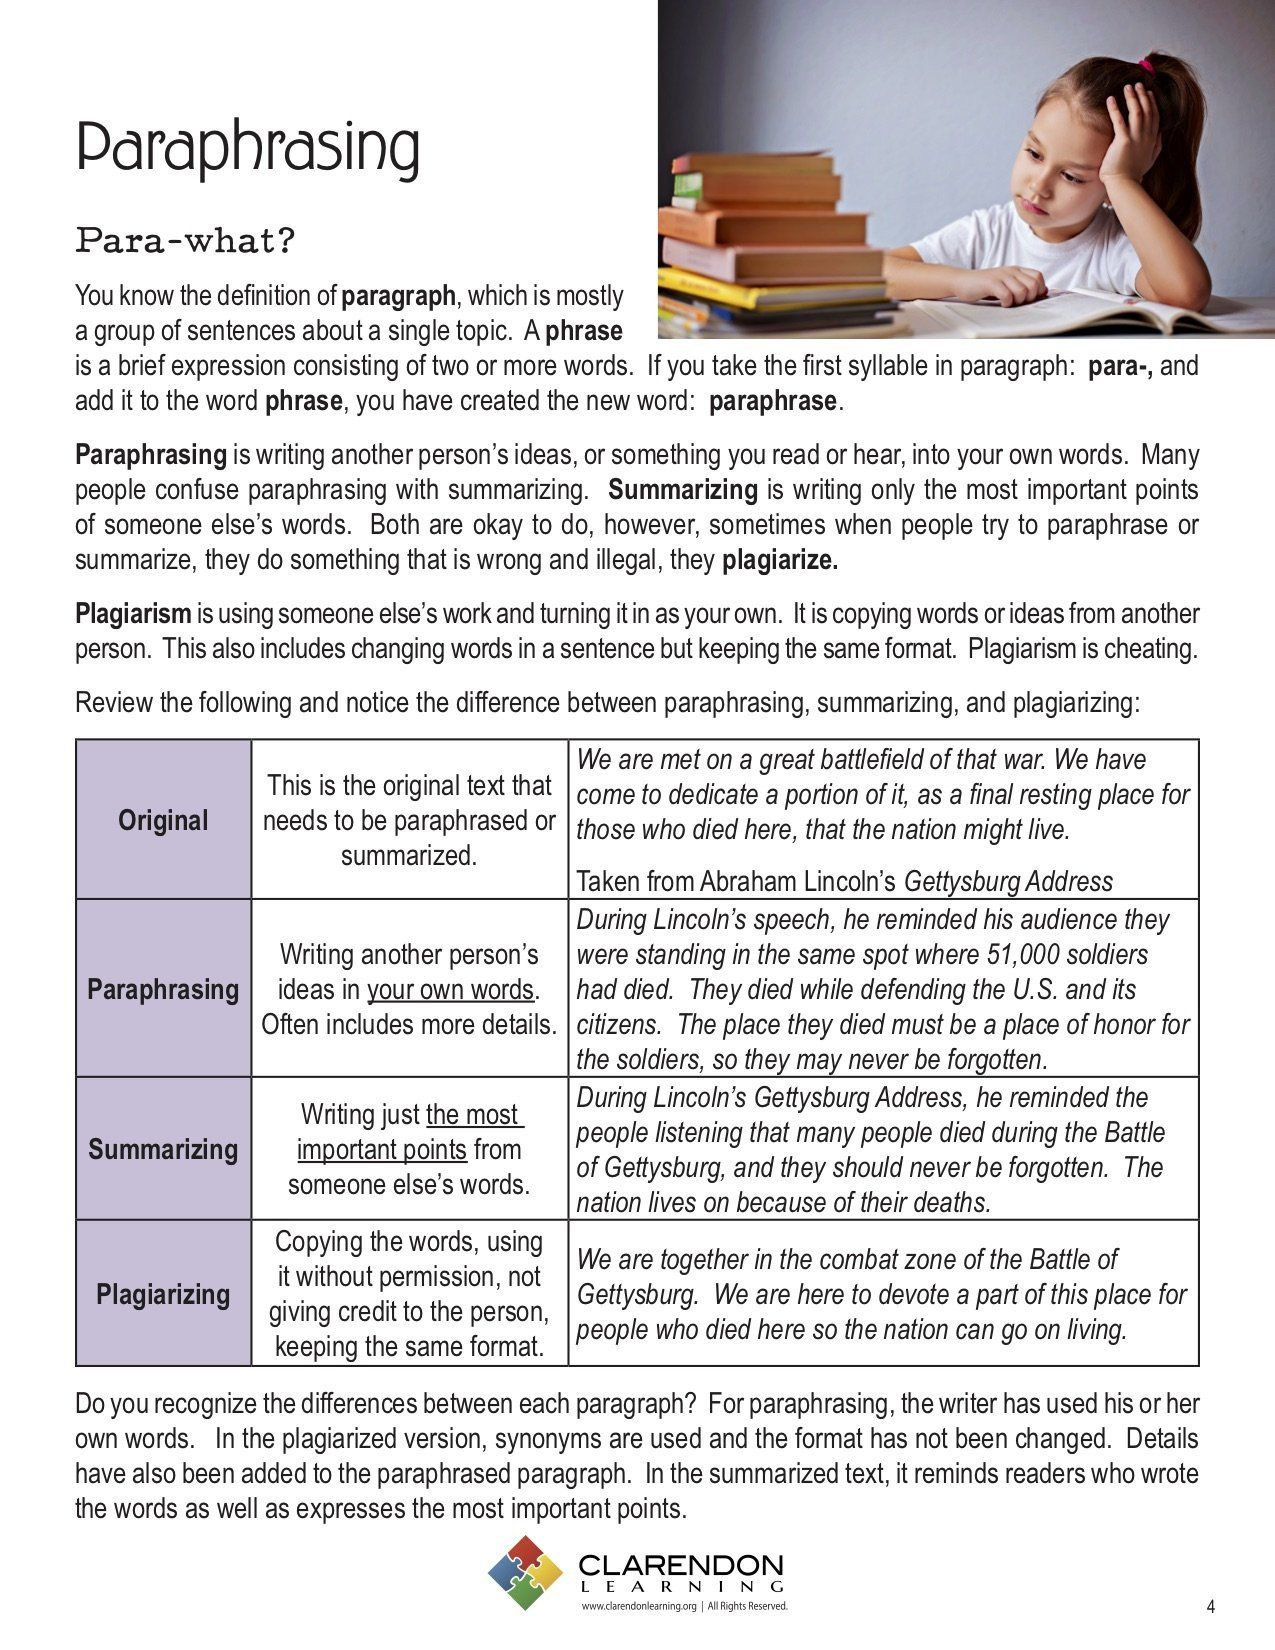 Paraphrase Worksheet 5th Grade Paraphrase Reasding